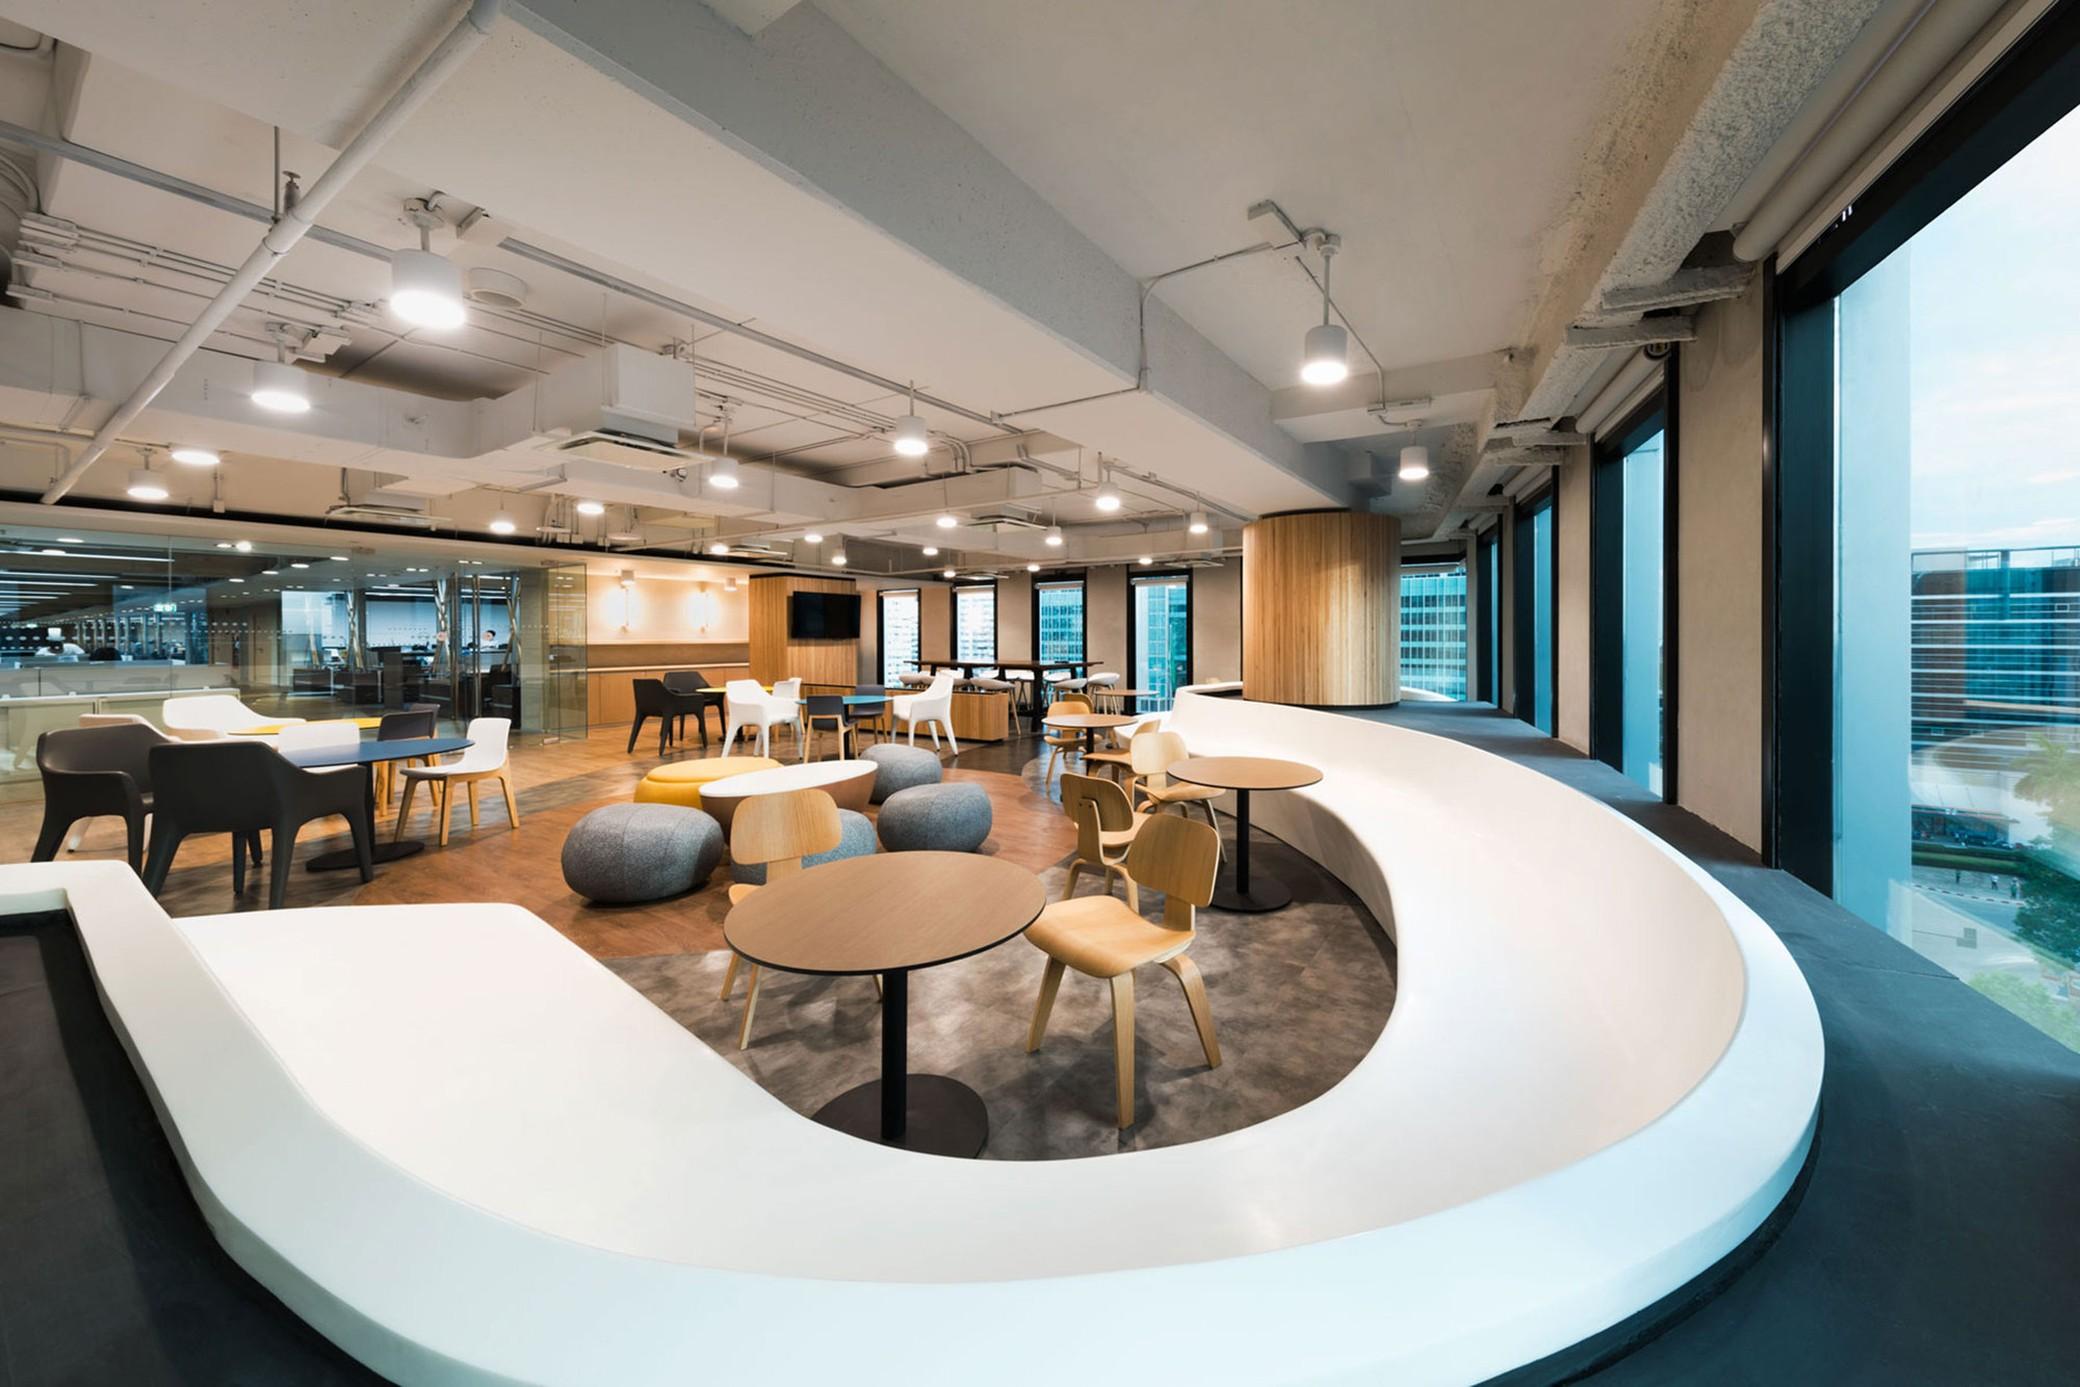 KASIKORN商业技术金融集团大楼办公设计案例